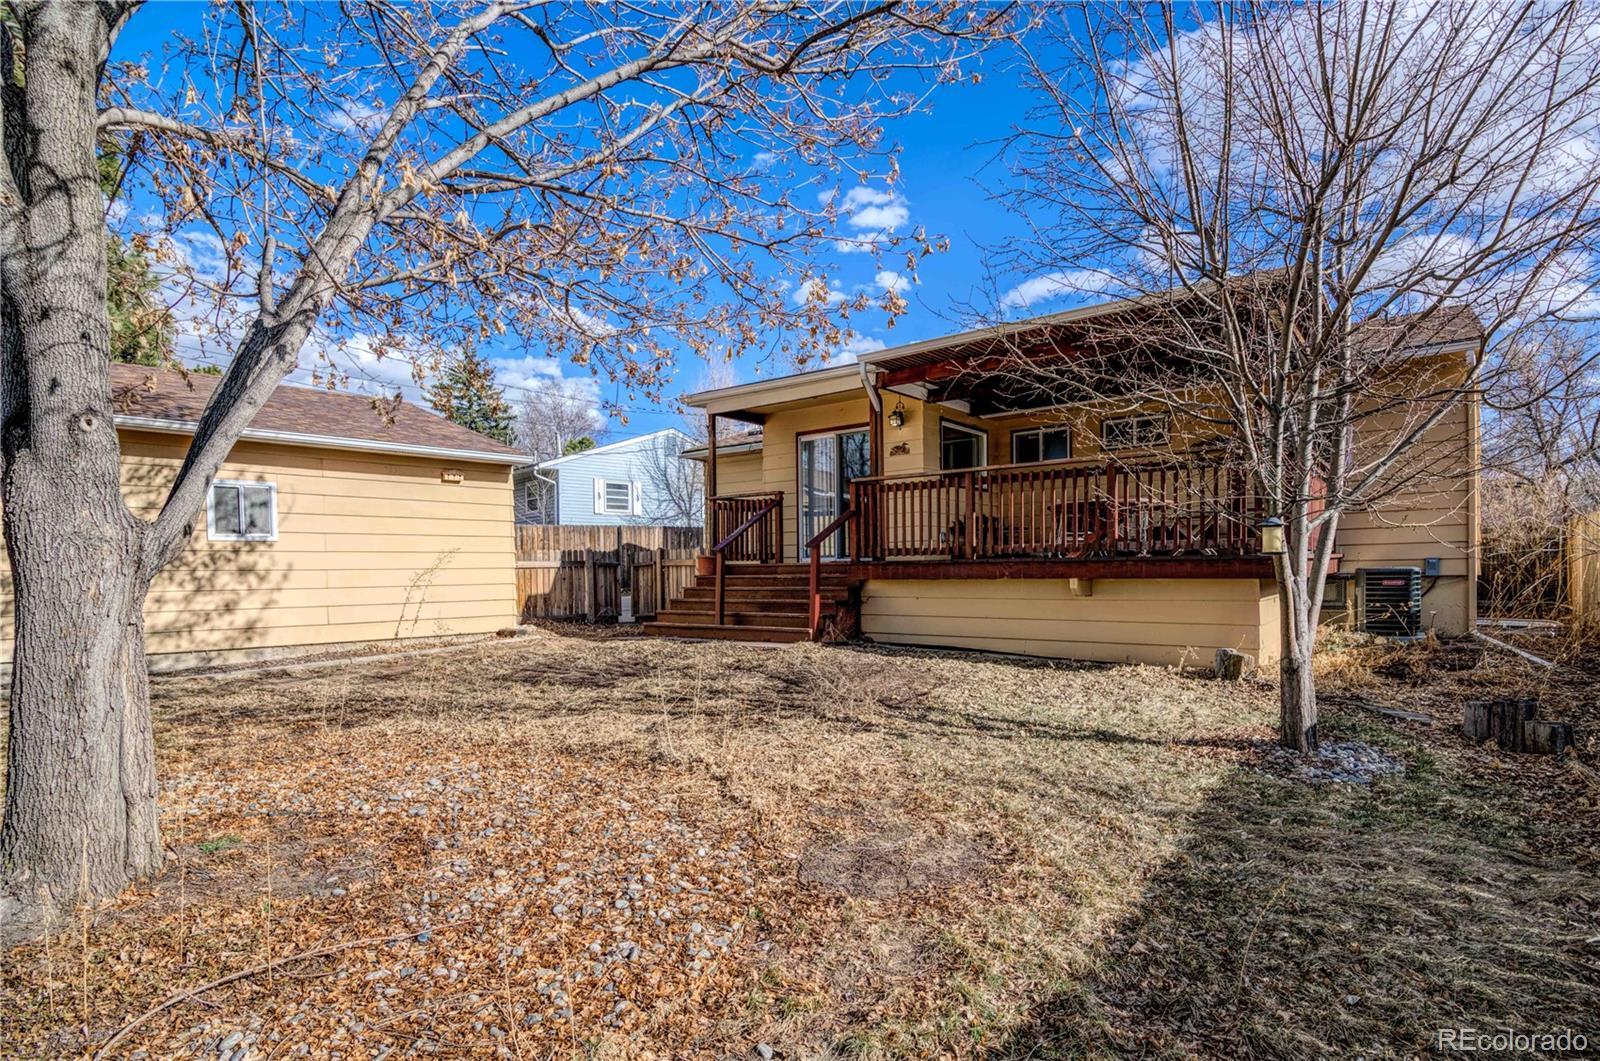 MLS# 5043109 - 32 - 1832 Northview Drive, Colorado Springs, CO 80909